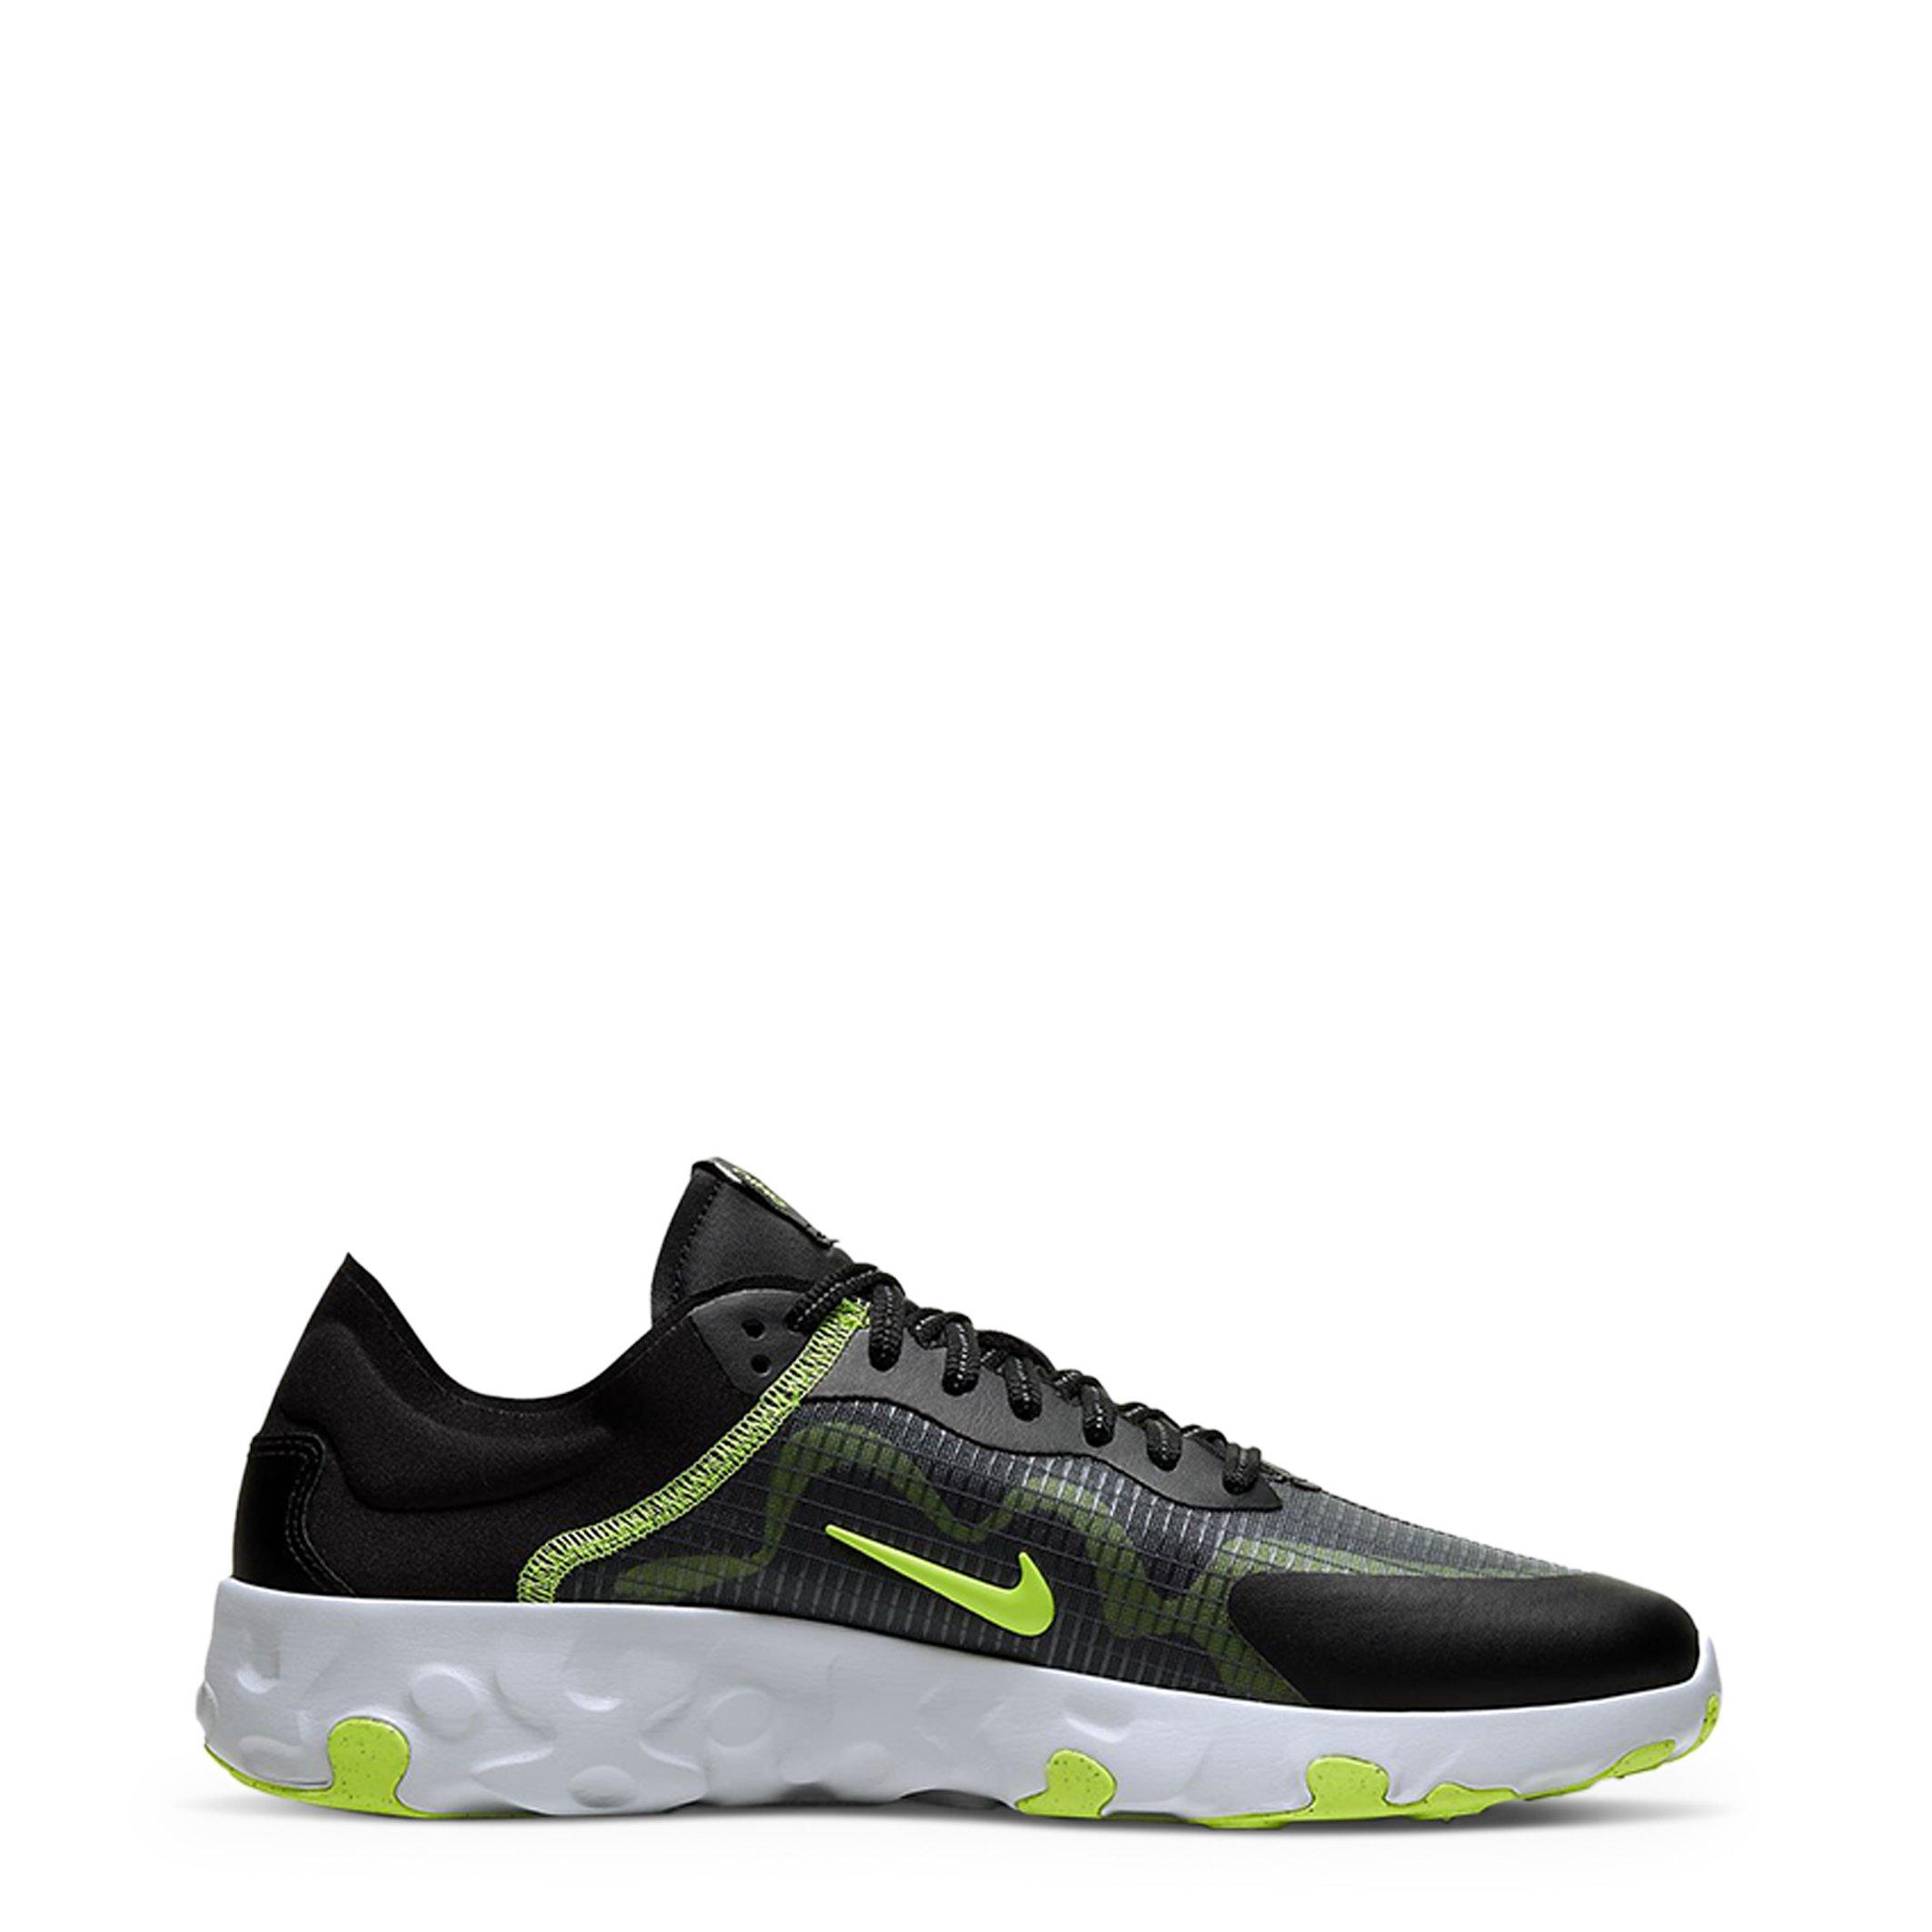 Nike Men's Renew Lucent Trainers Various Colours BQ4235 - black-1 US 6